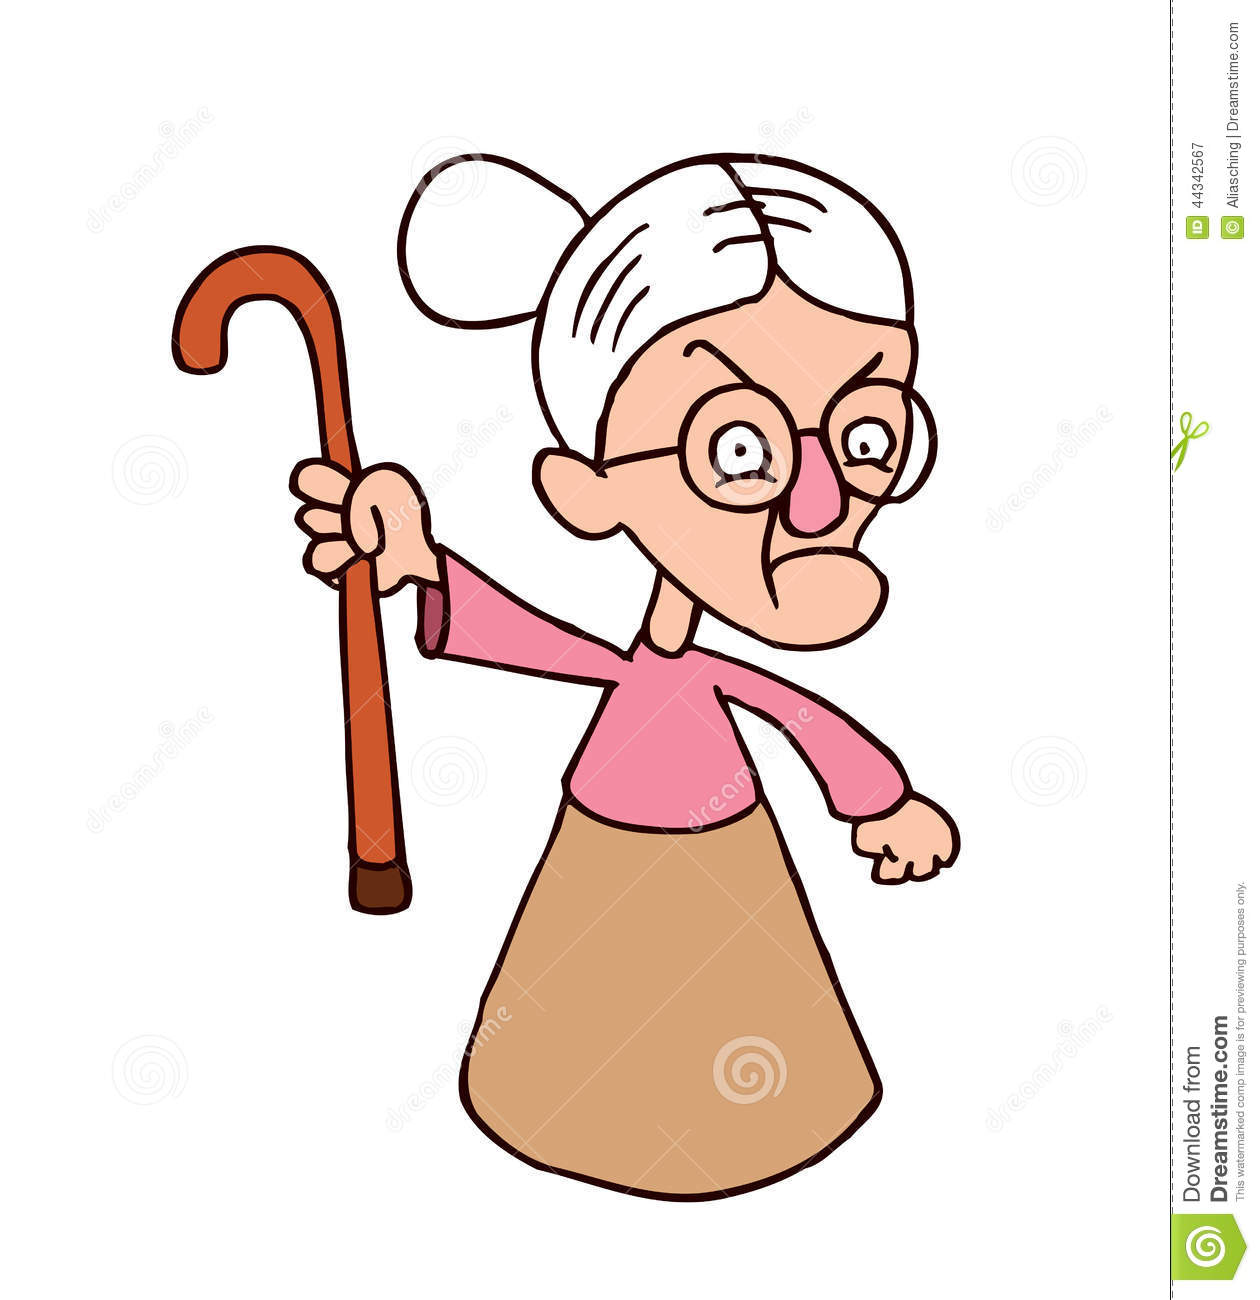 funny granny clipart - photo #14